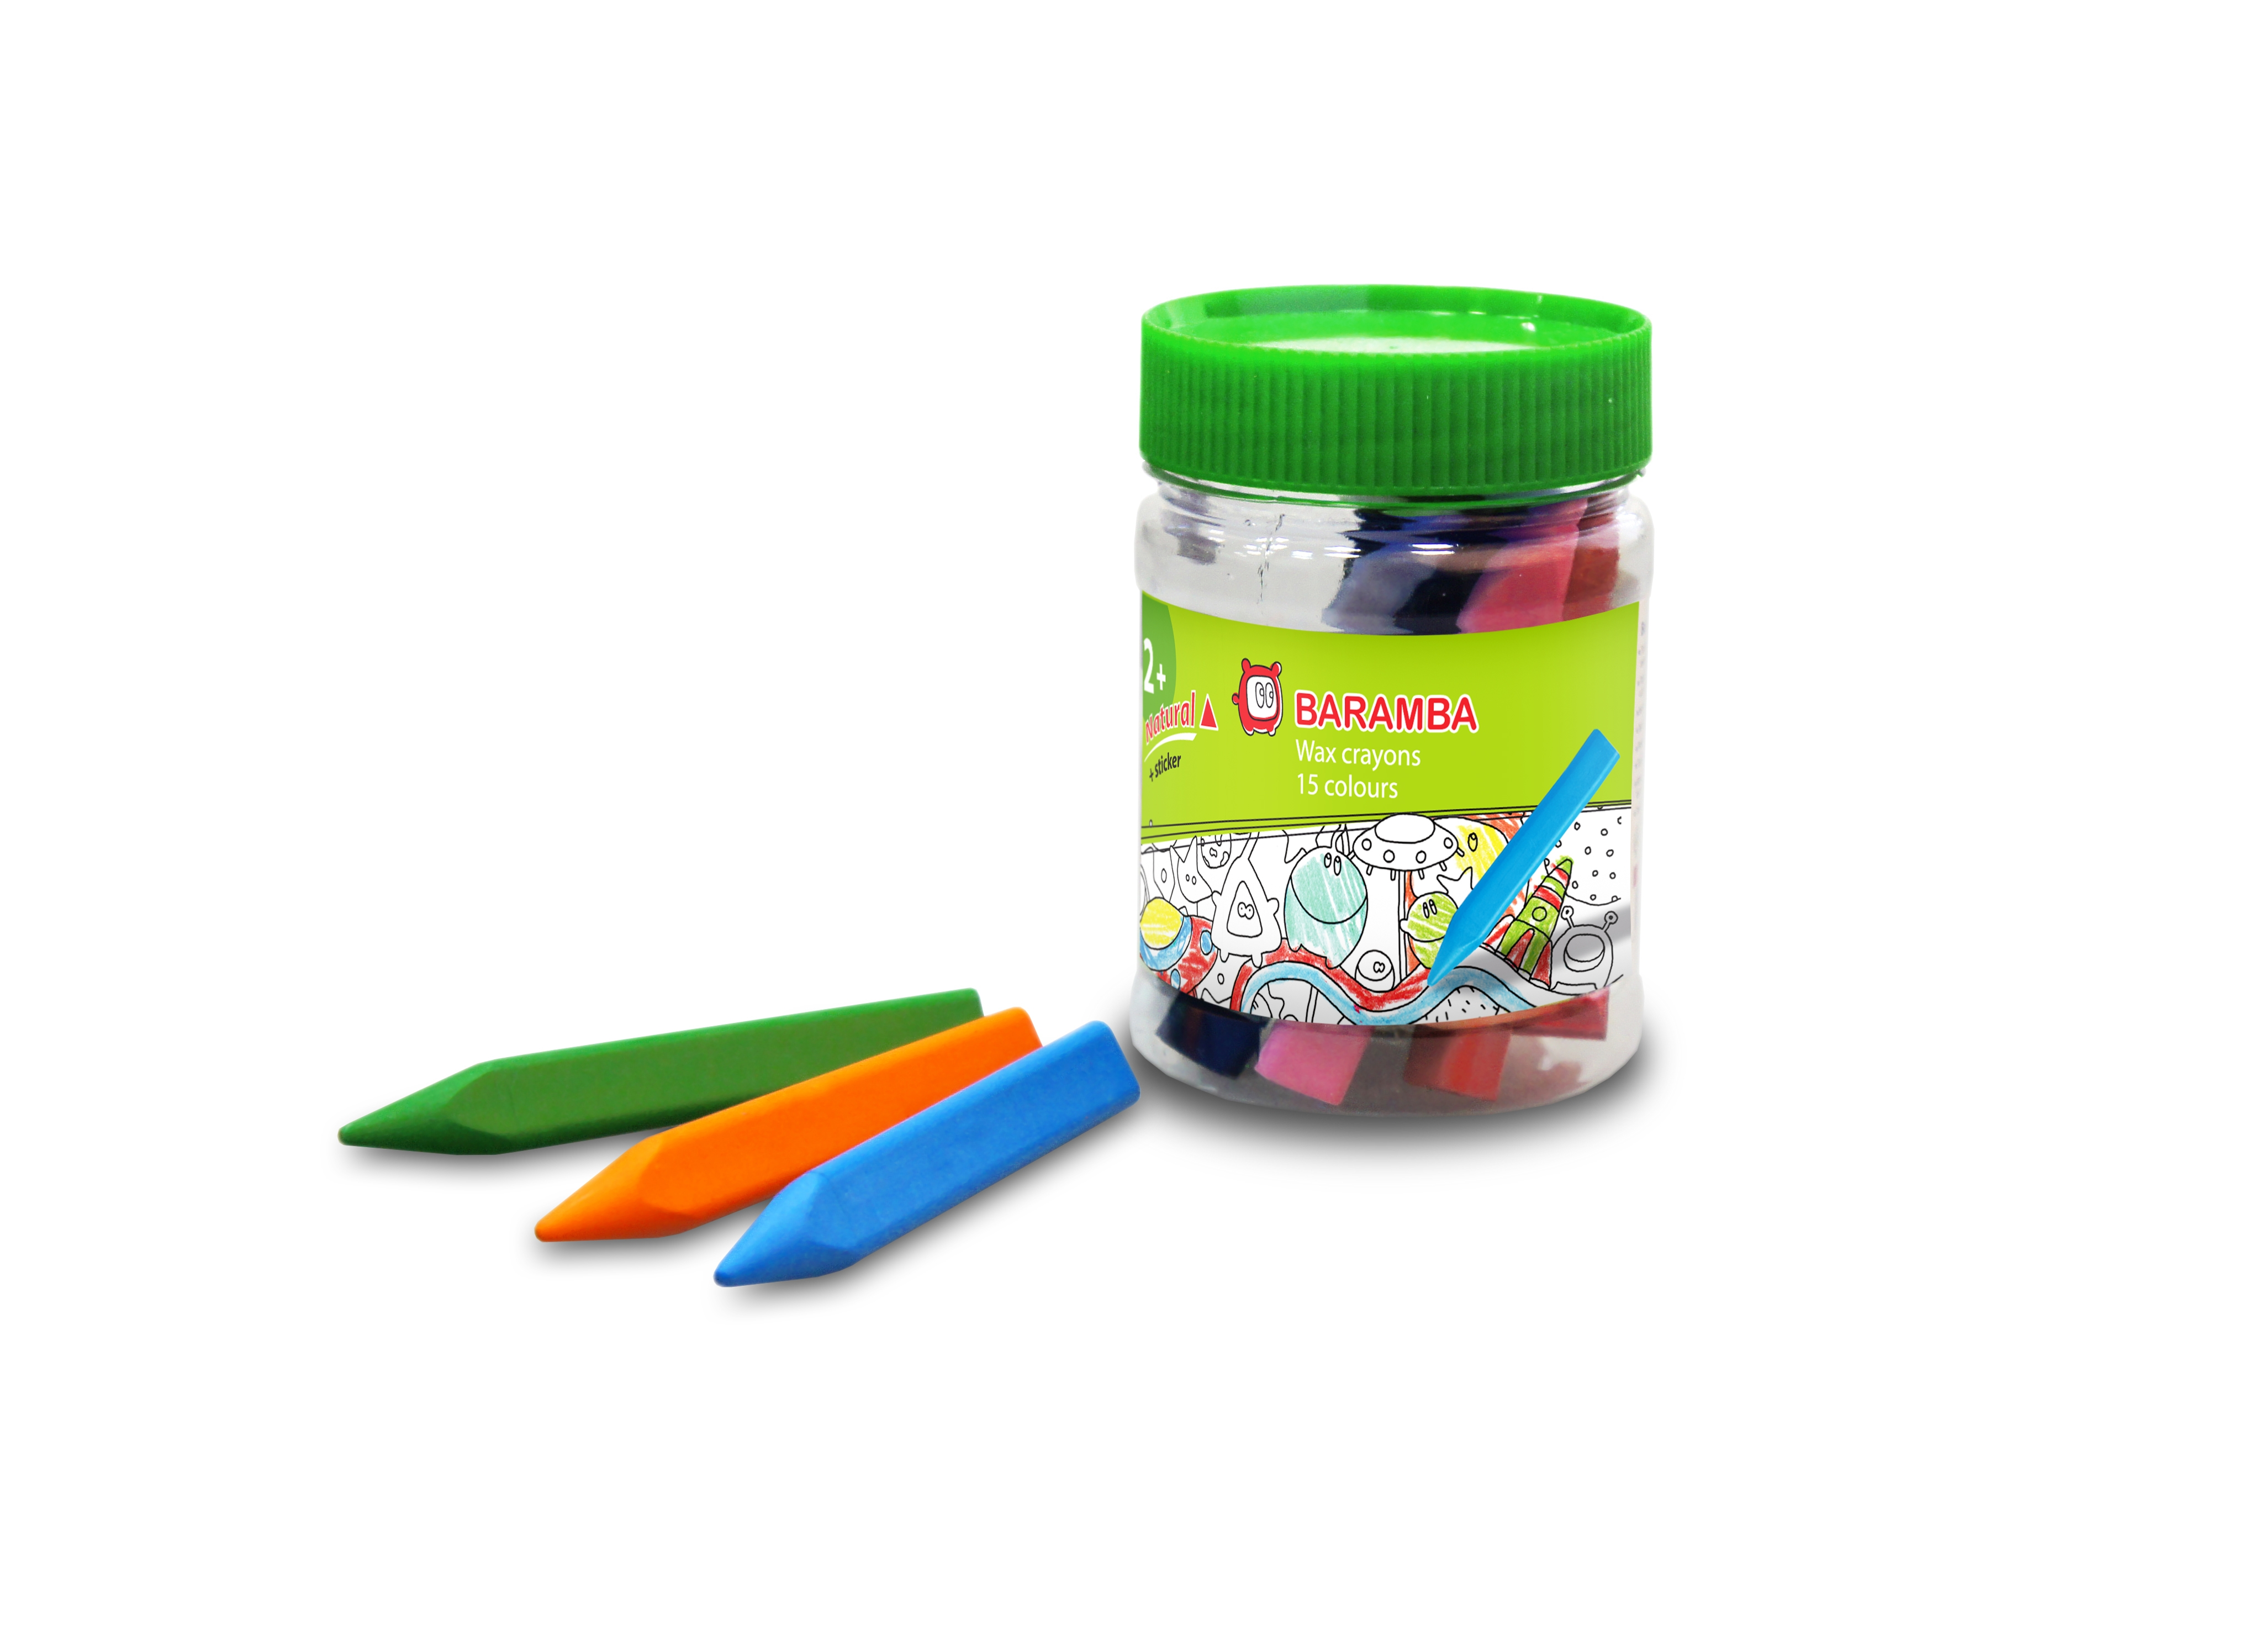 Ручки и карандаши Baramba Карандаши восковые Baramba треугольные 15 цв. с точилкой и раскраской карандаши восковые мелки пастель berlingo карандаши замки 18 цветов